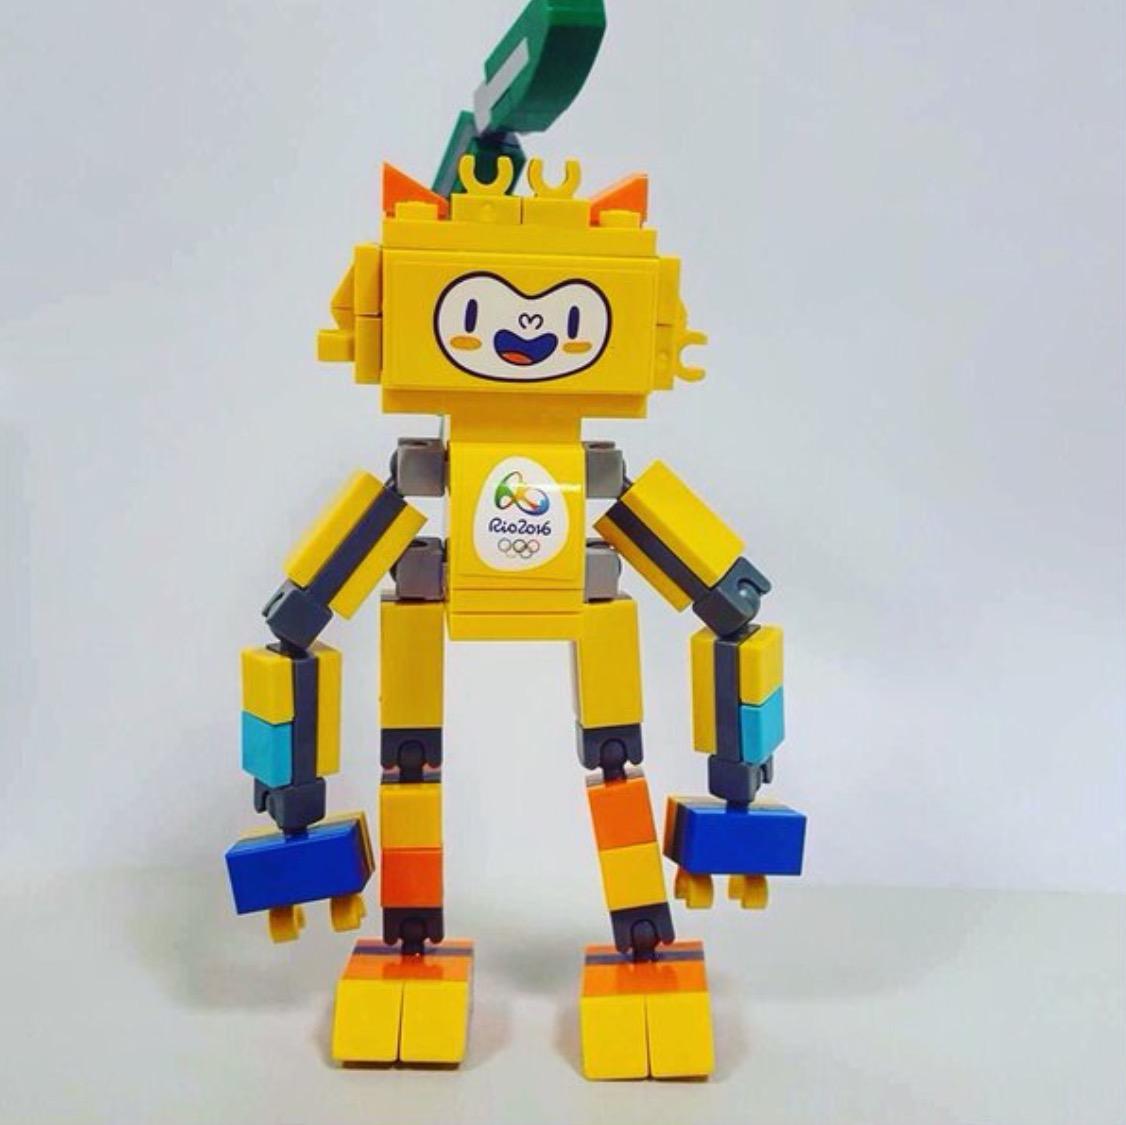 40225 Rio 2016 Olympic Mascots  a closer look  Brickset LEGO